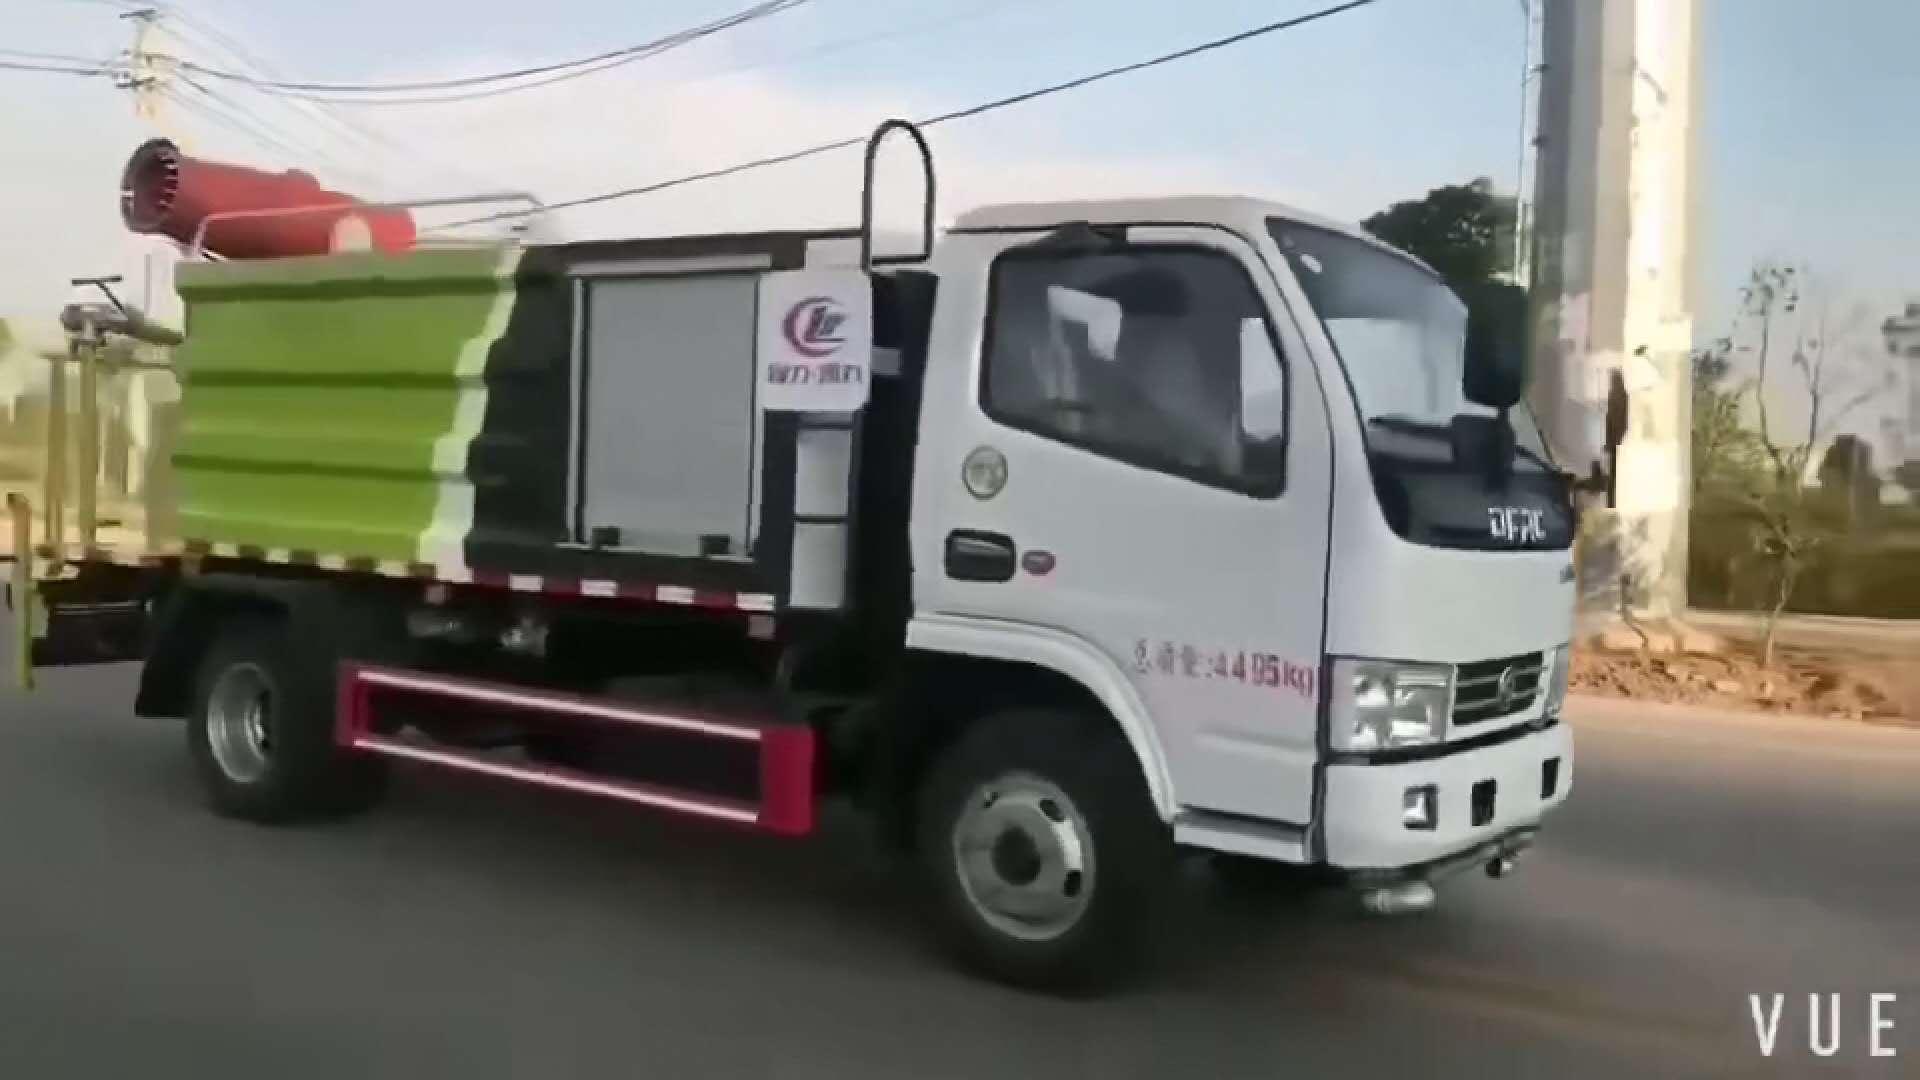 C证可以开的抑尘车——东风小多利卡蓝牌抑尘车